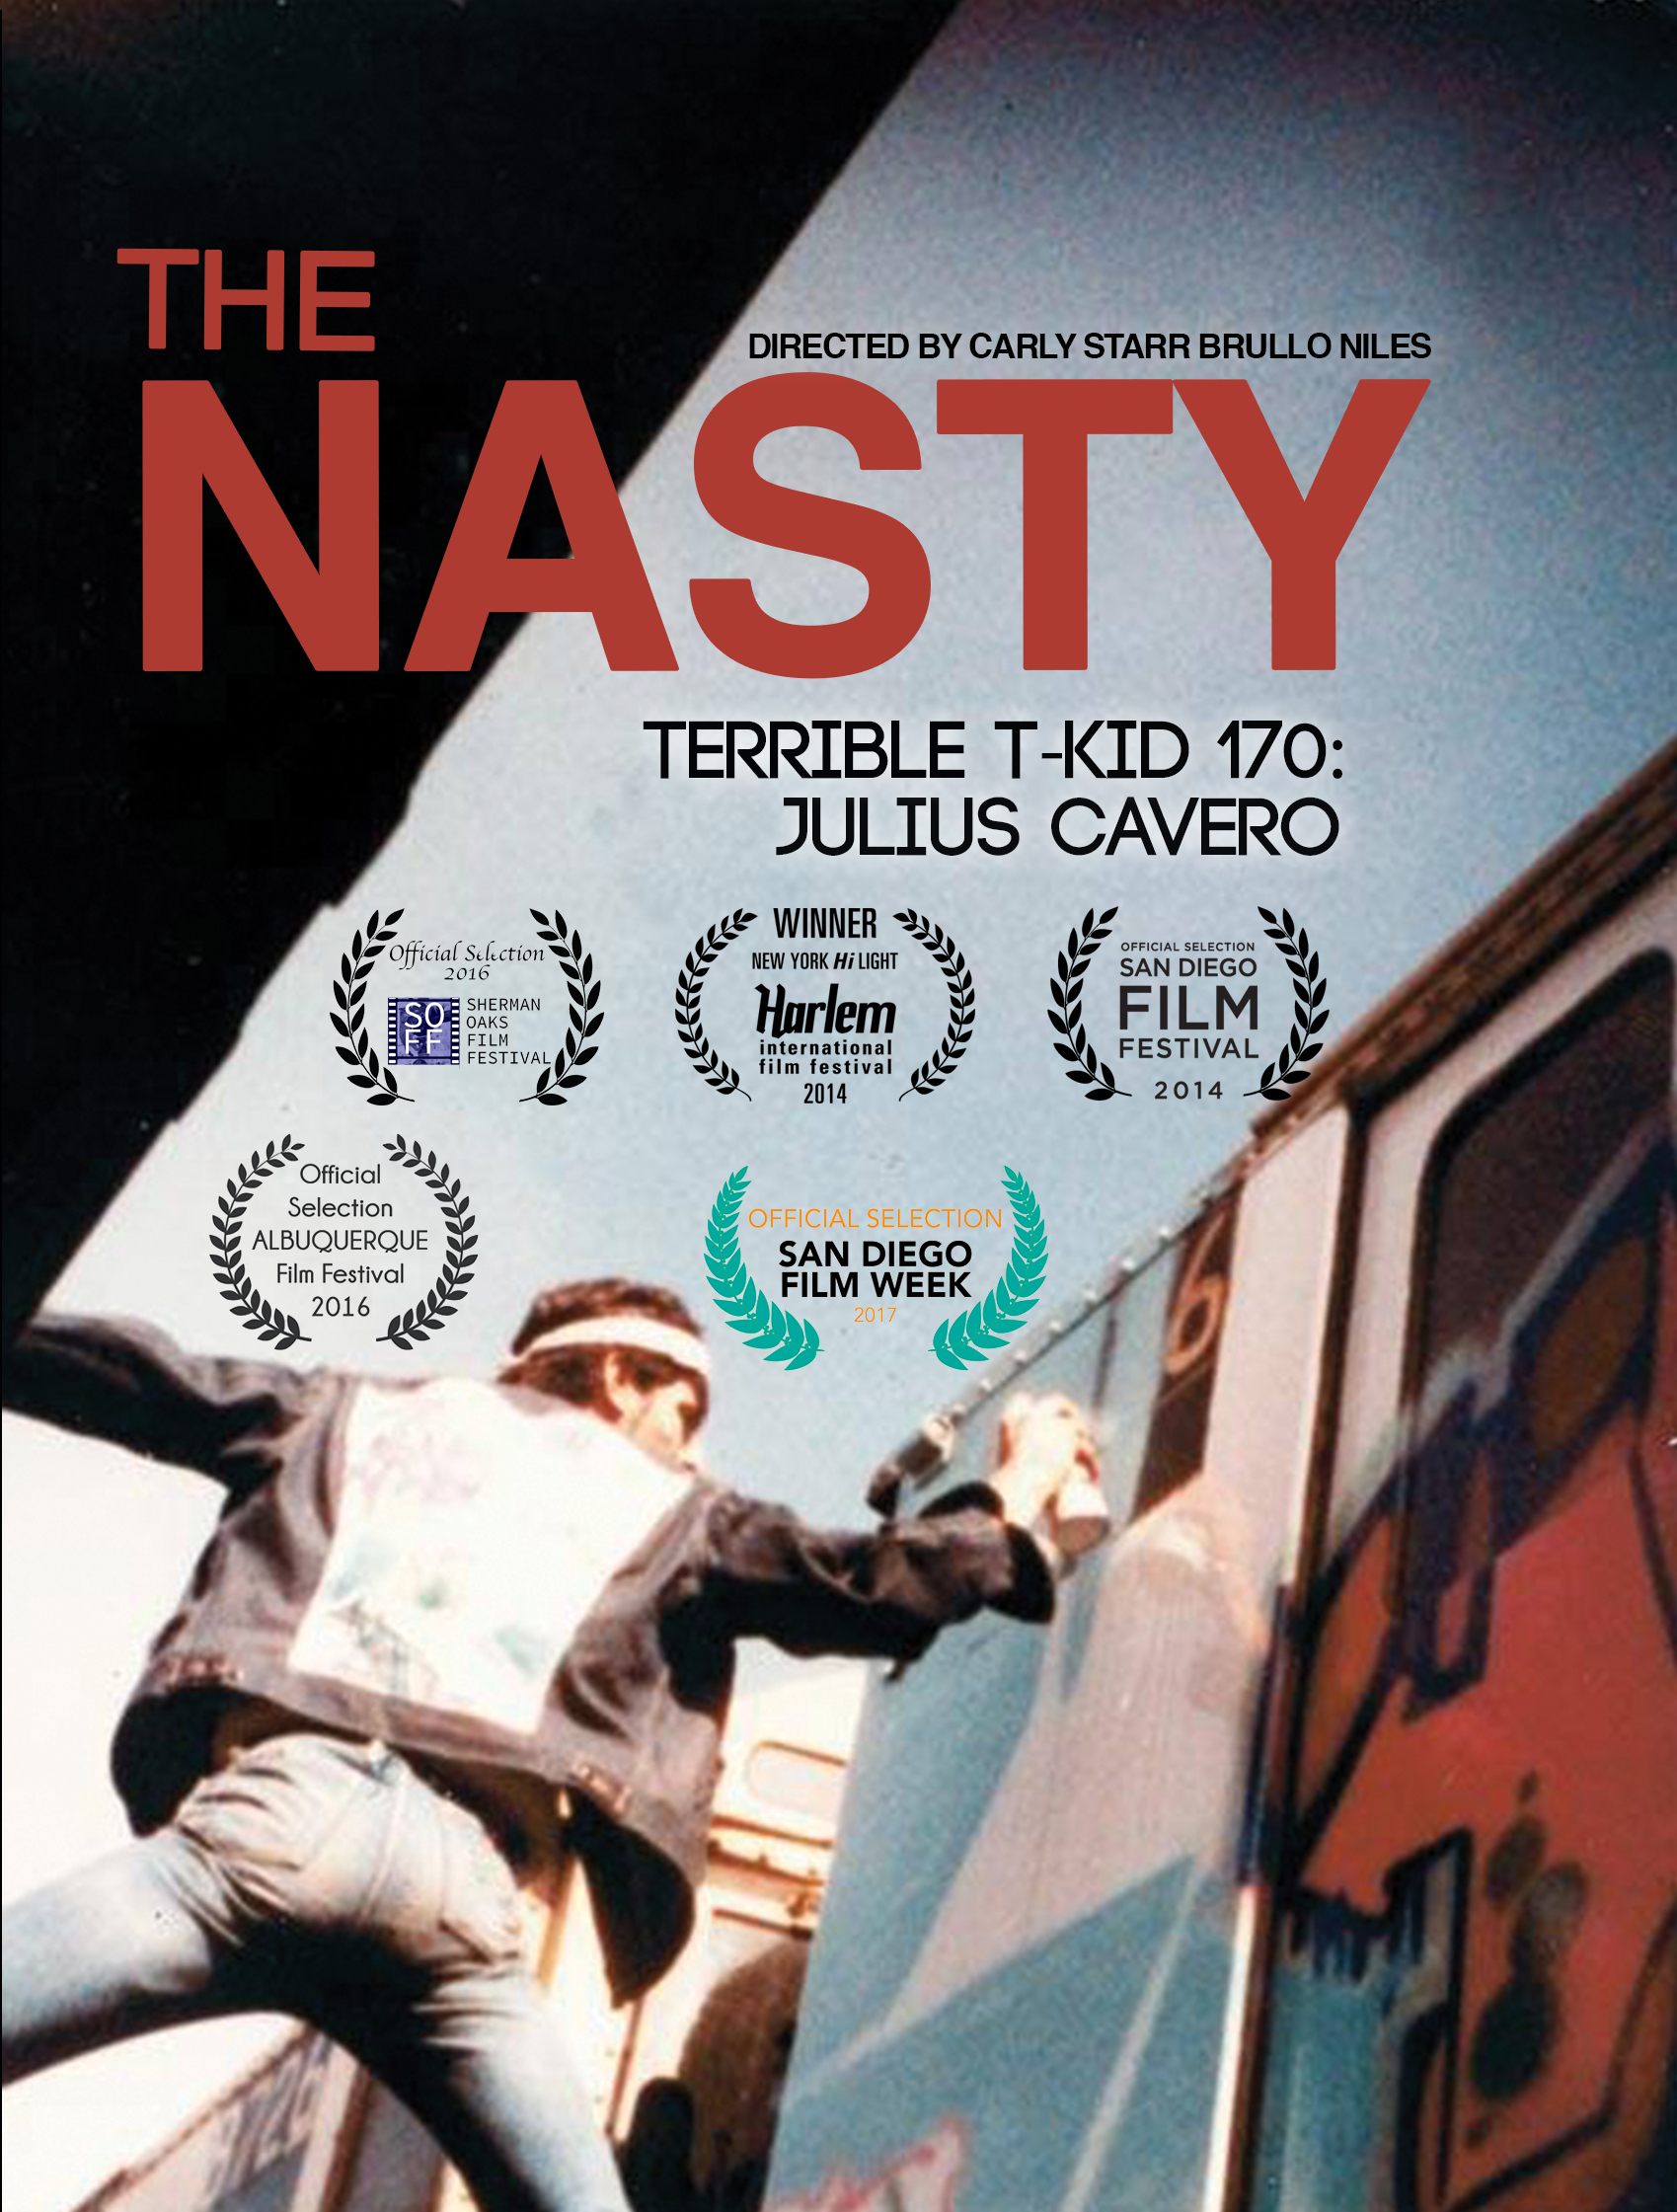 image The Nasty Terrible T-Kid 170: Julius Cavero Watch Full Movie Free Online